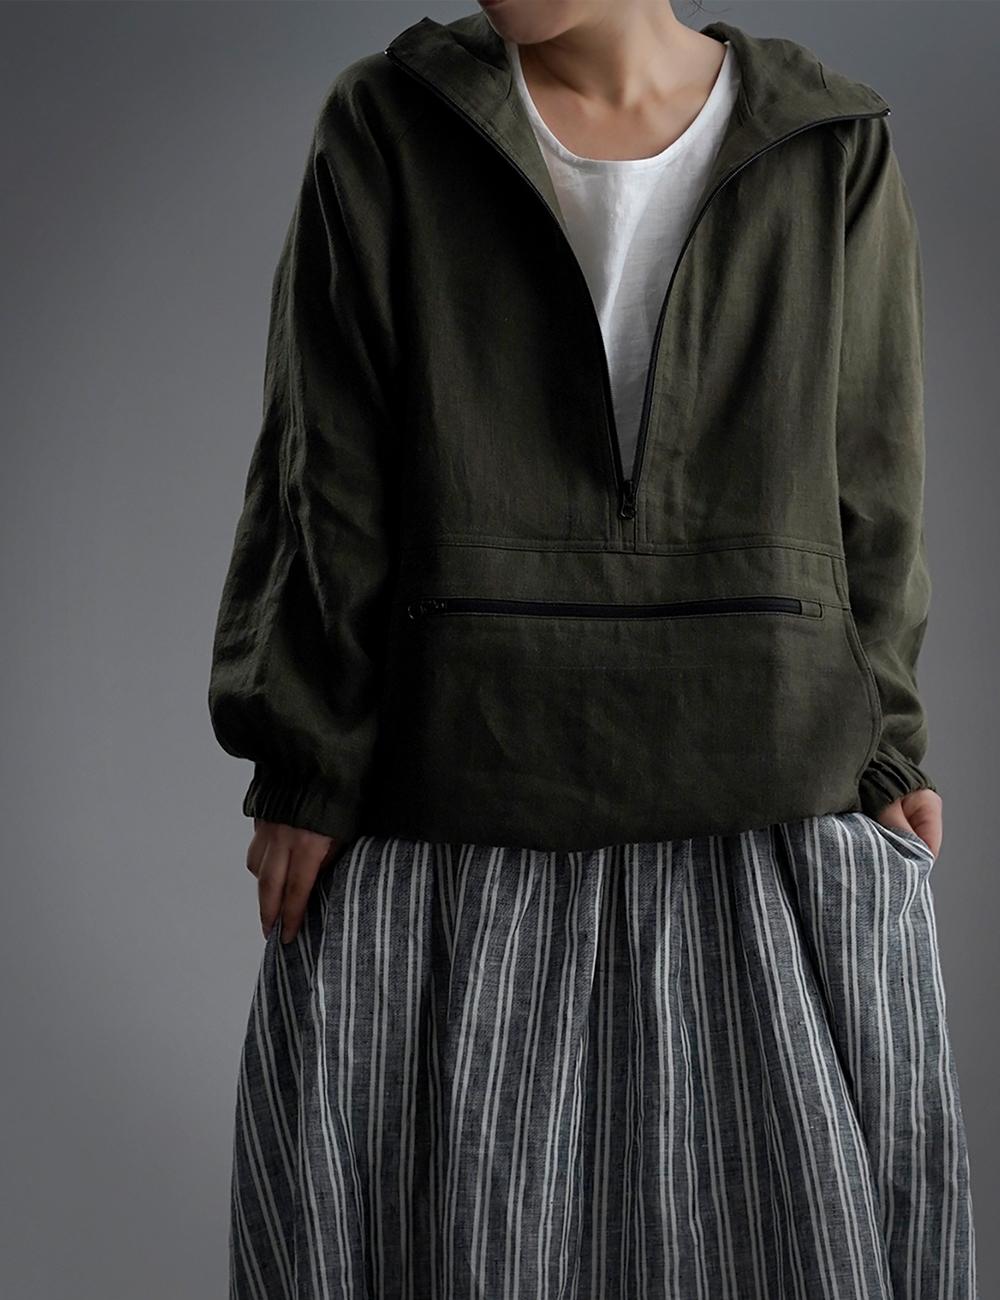 【wafu】Linen Anorak アノラック パーカー /カーキ h053b-khk2